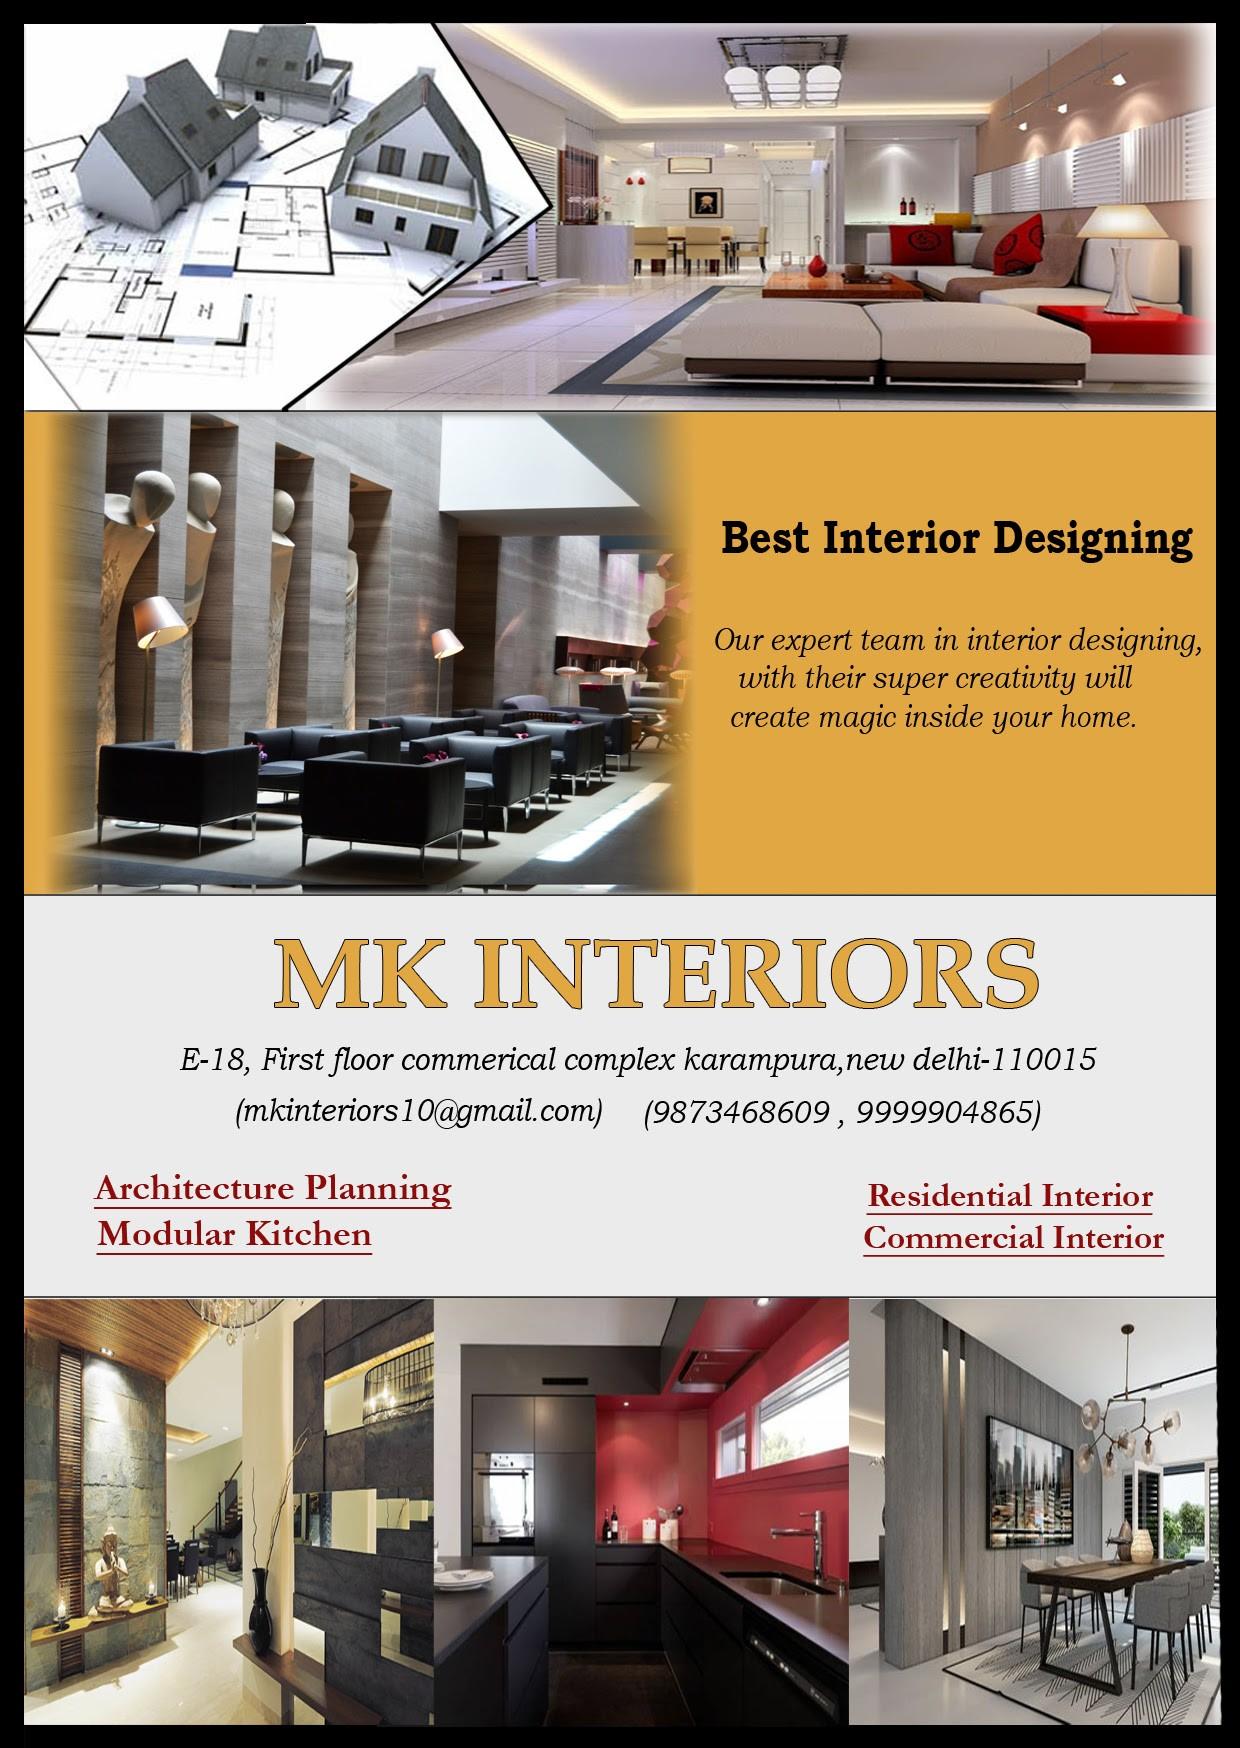 MK INTERIORS cover image